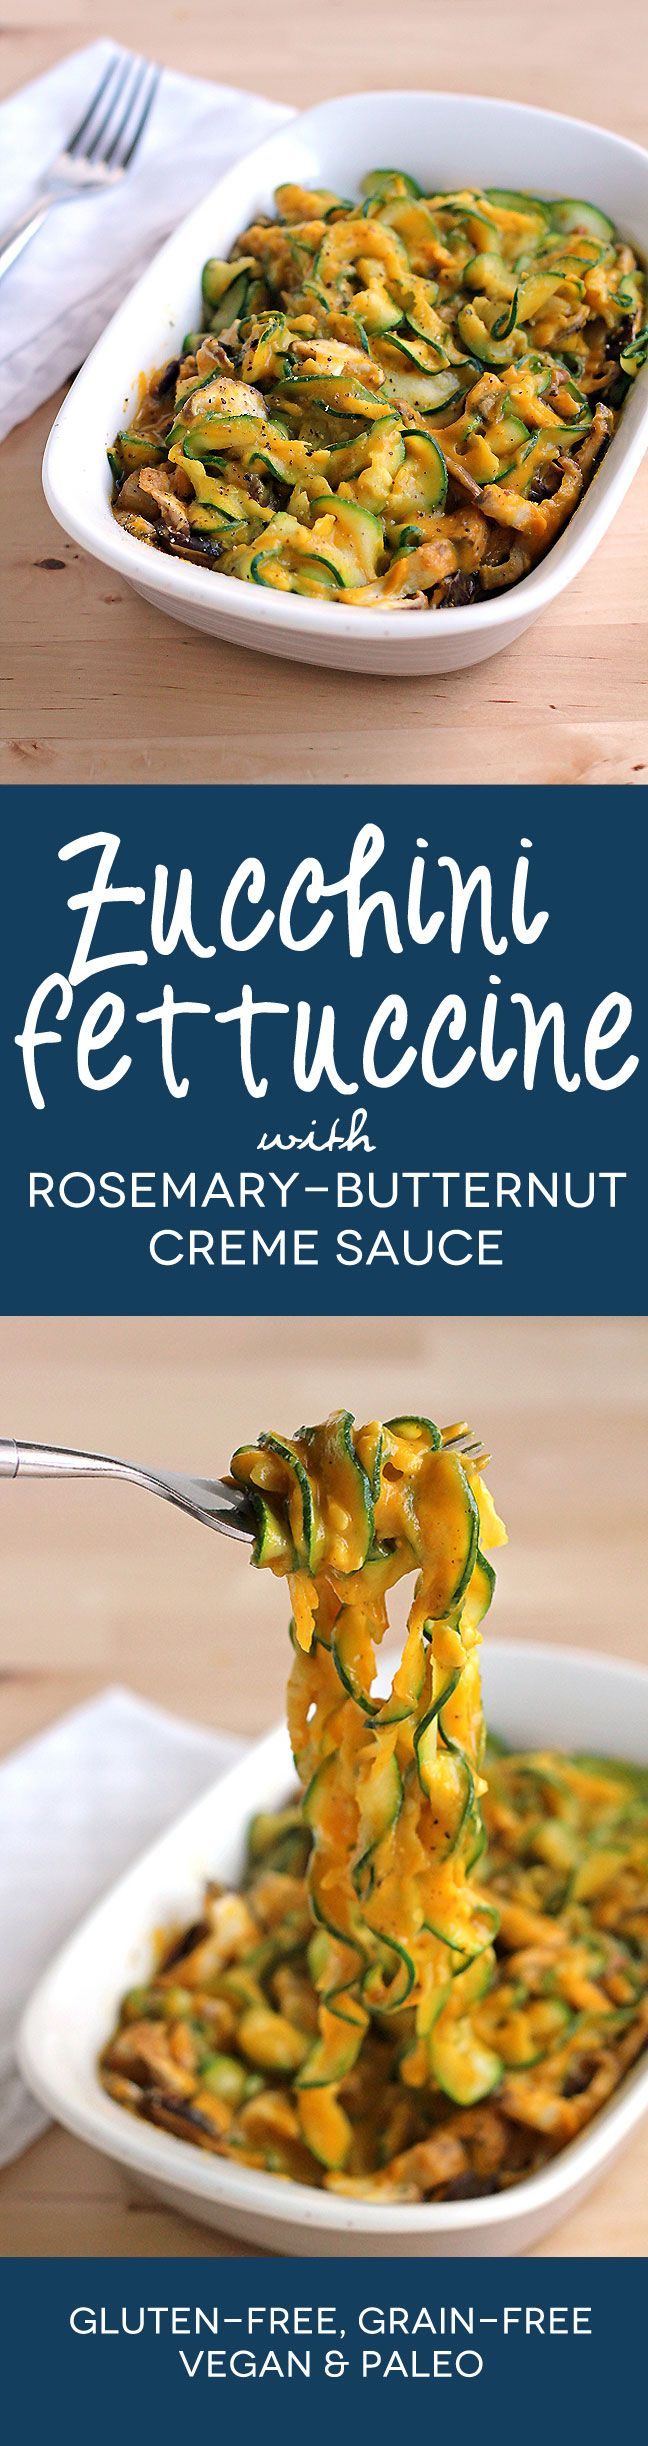 #Zucchini Fettuccine with Rosemary Butternut Creme Sauce #paleo #grainfree